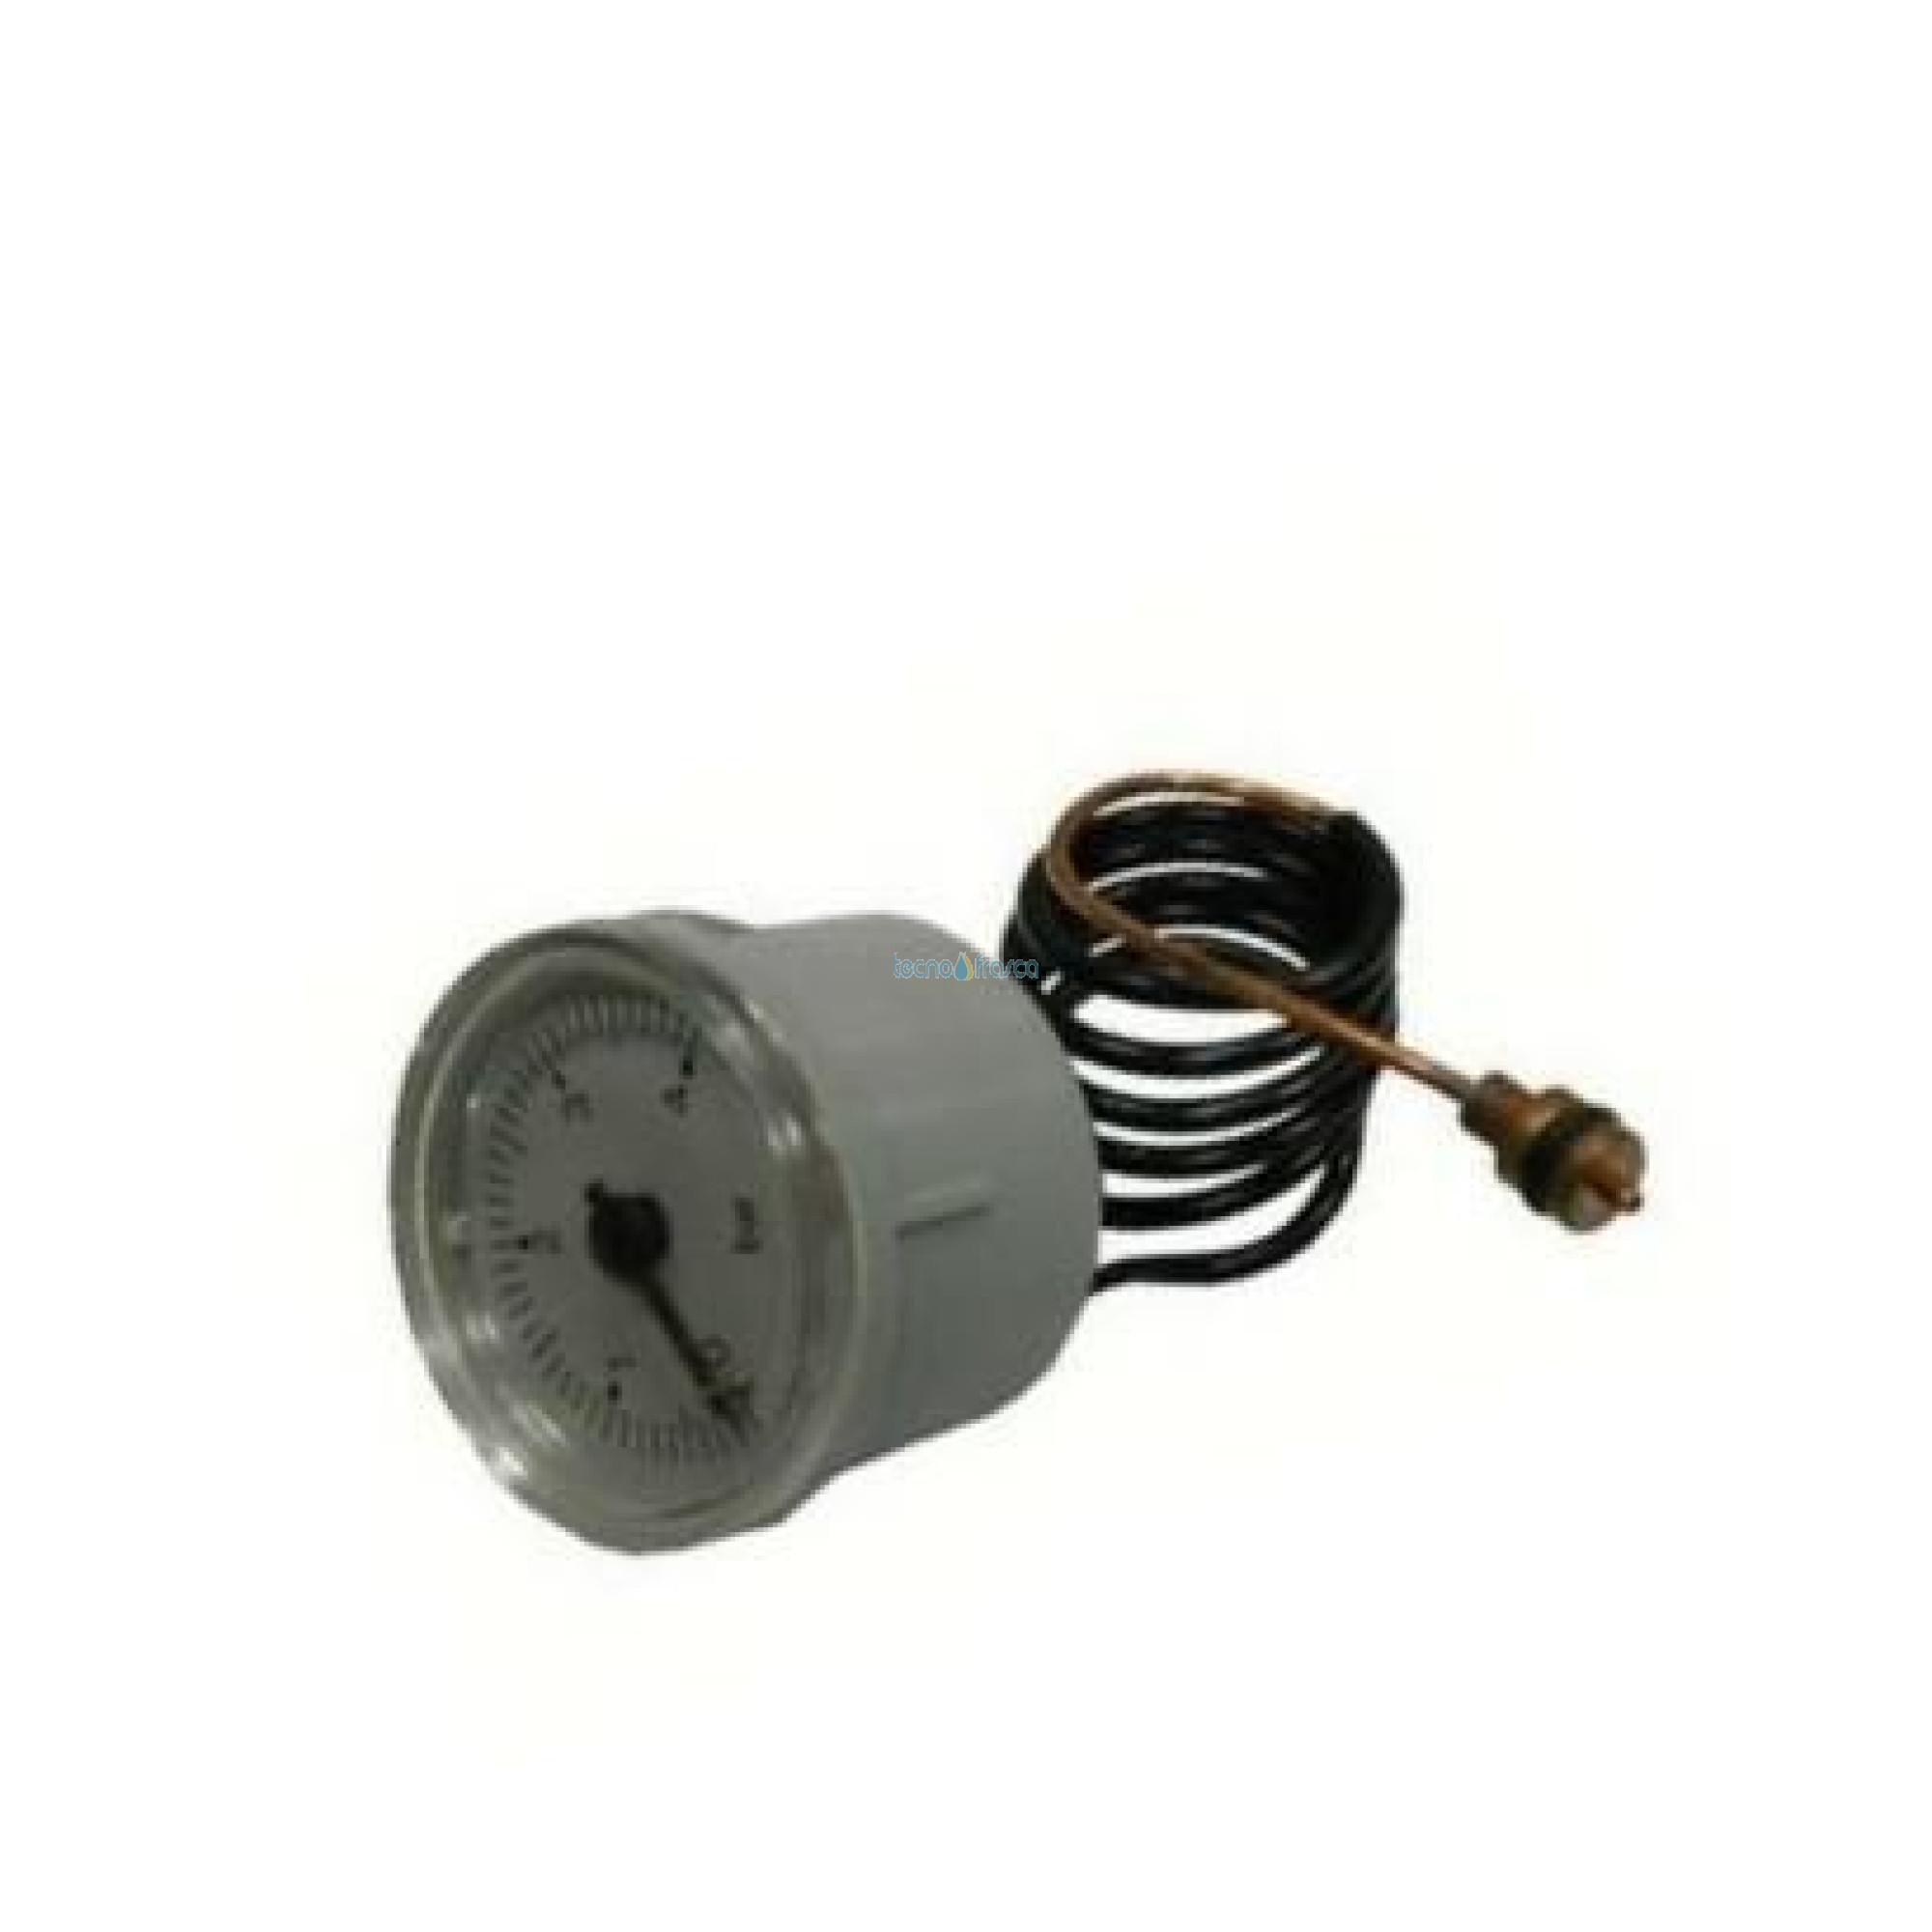 Beretta idrometro ad innesto rapido R10024664